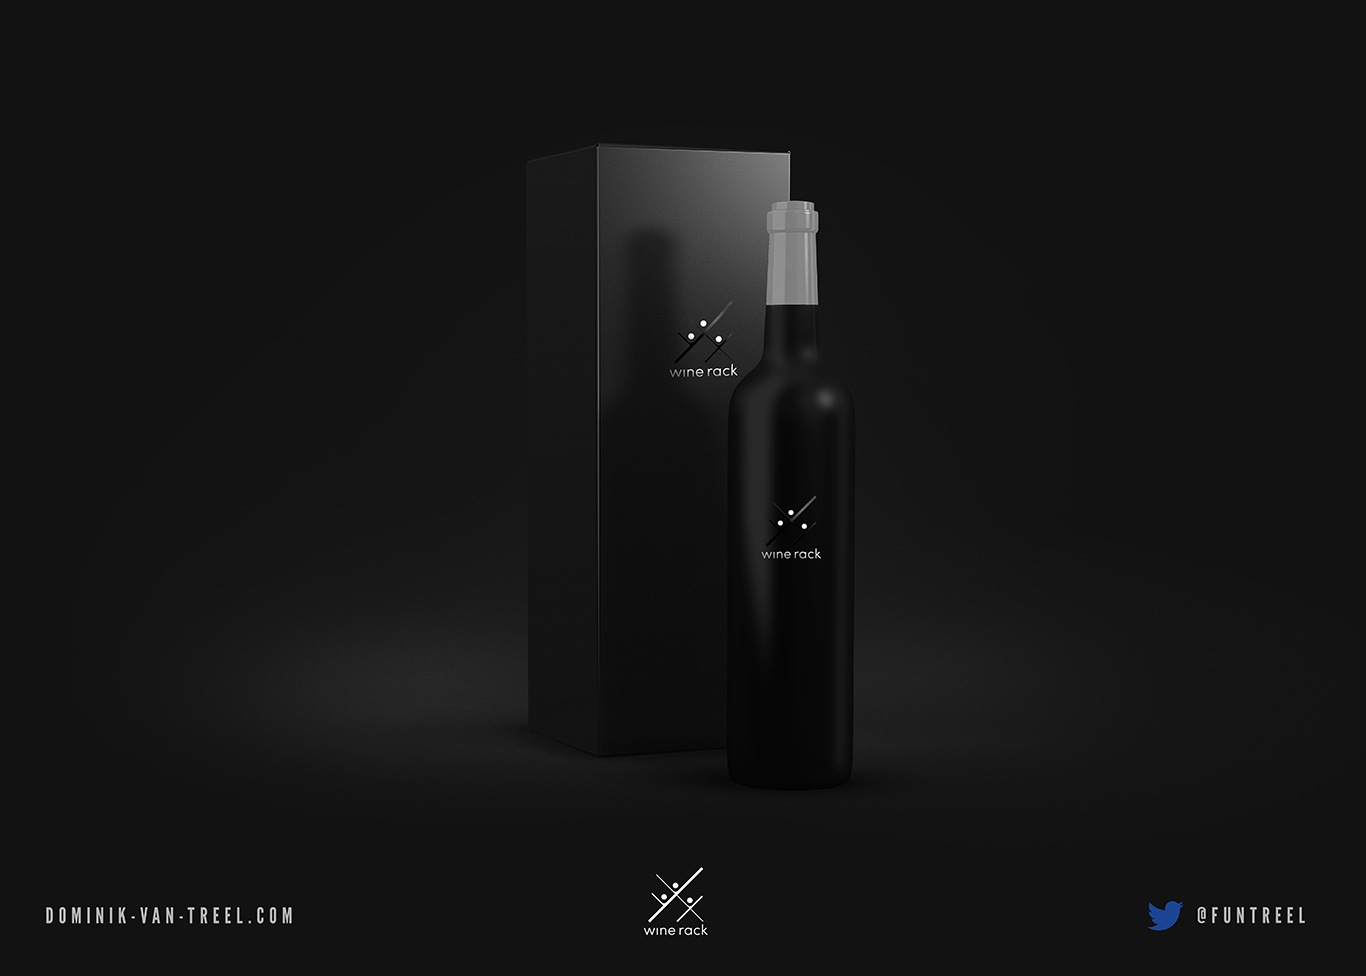 winerack-bottle-mockup